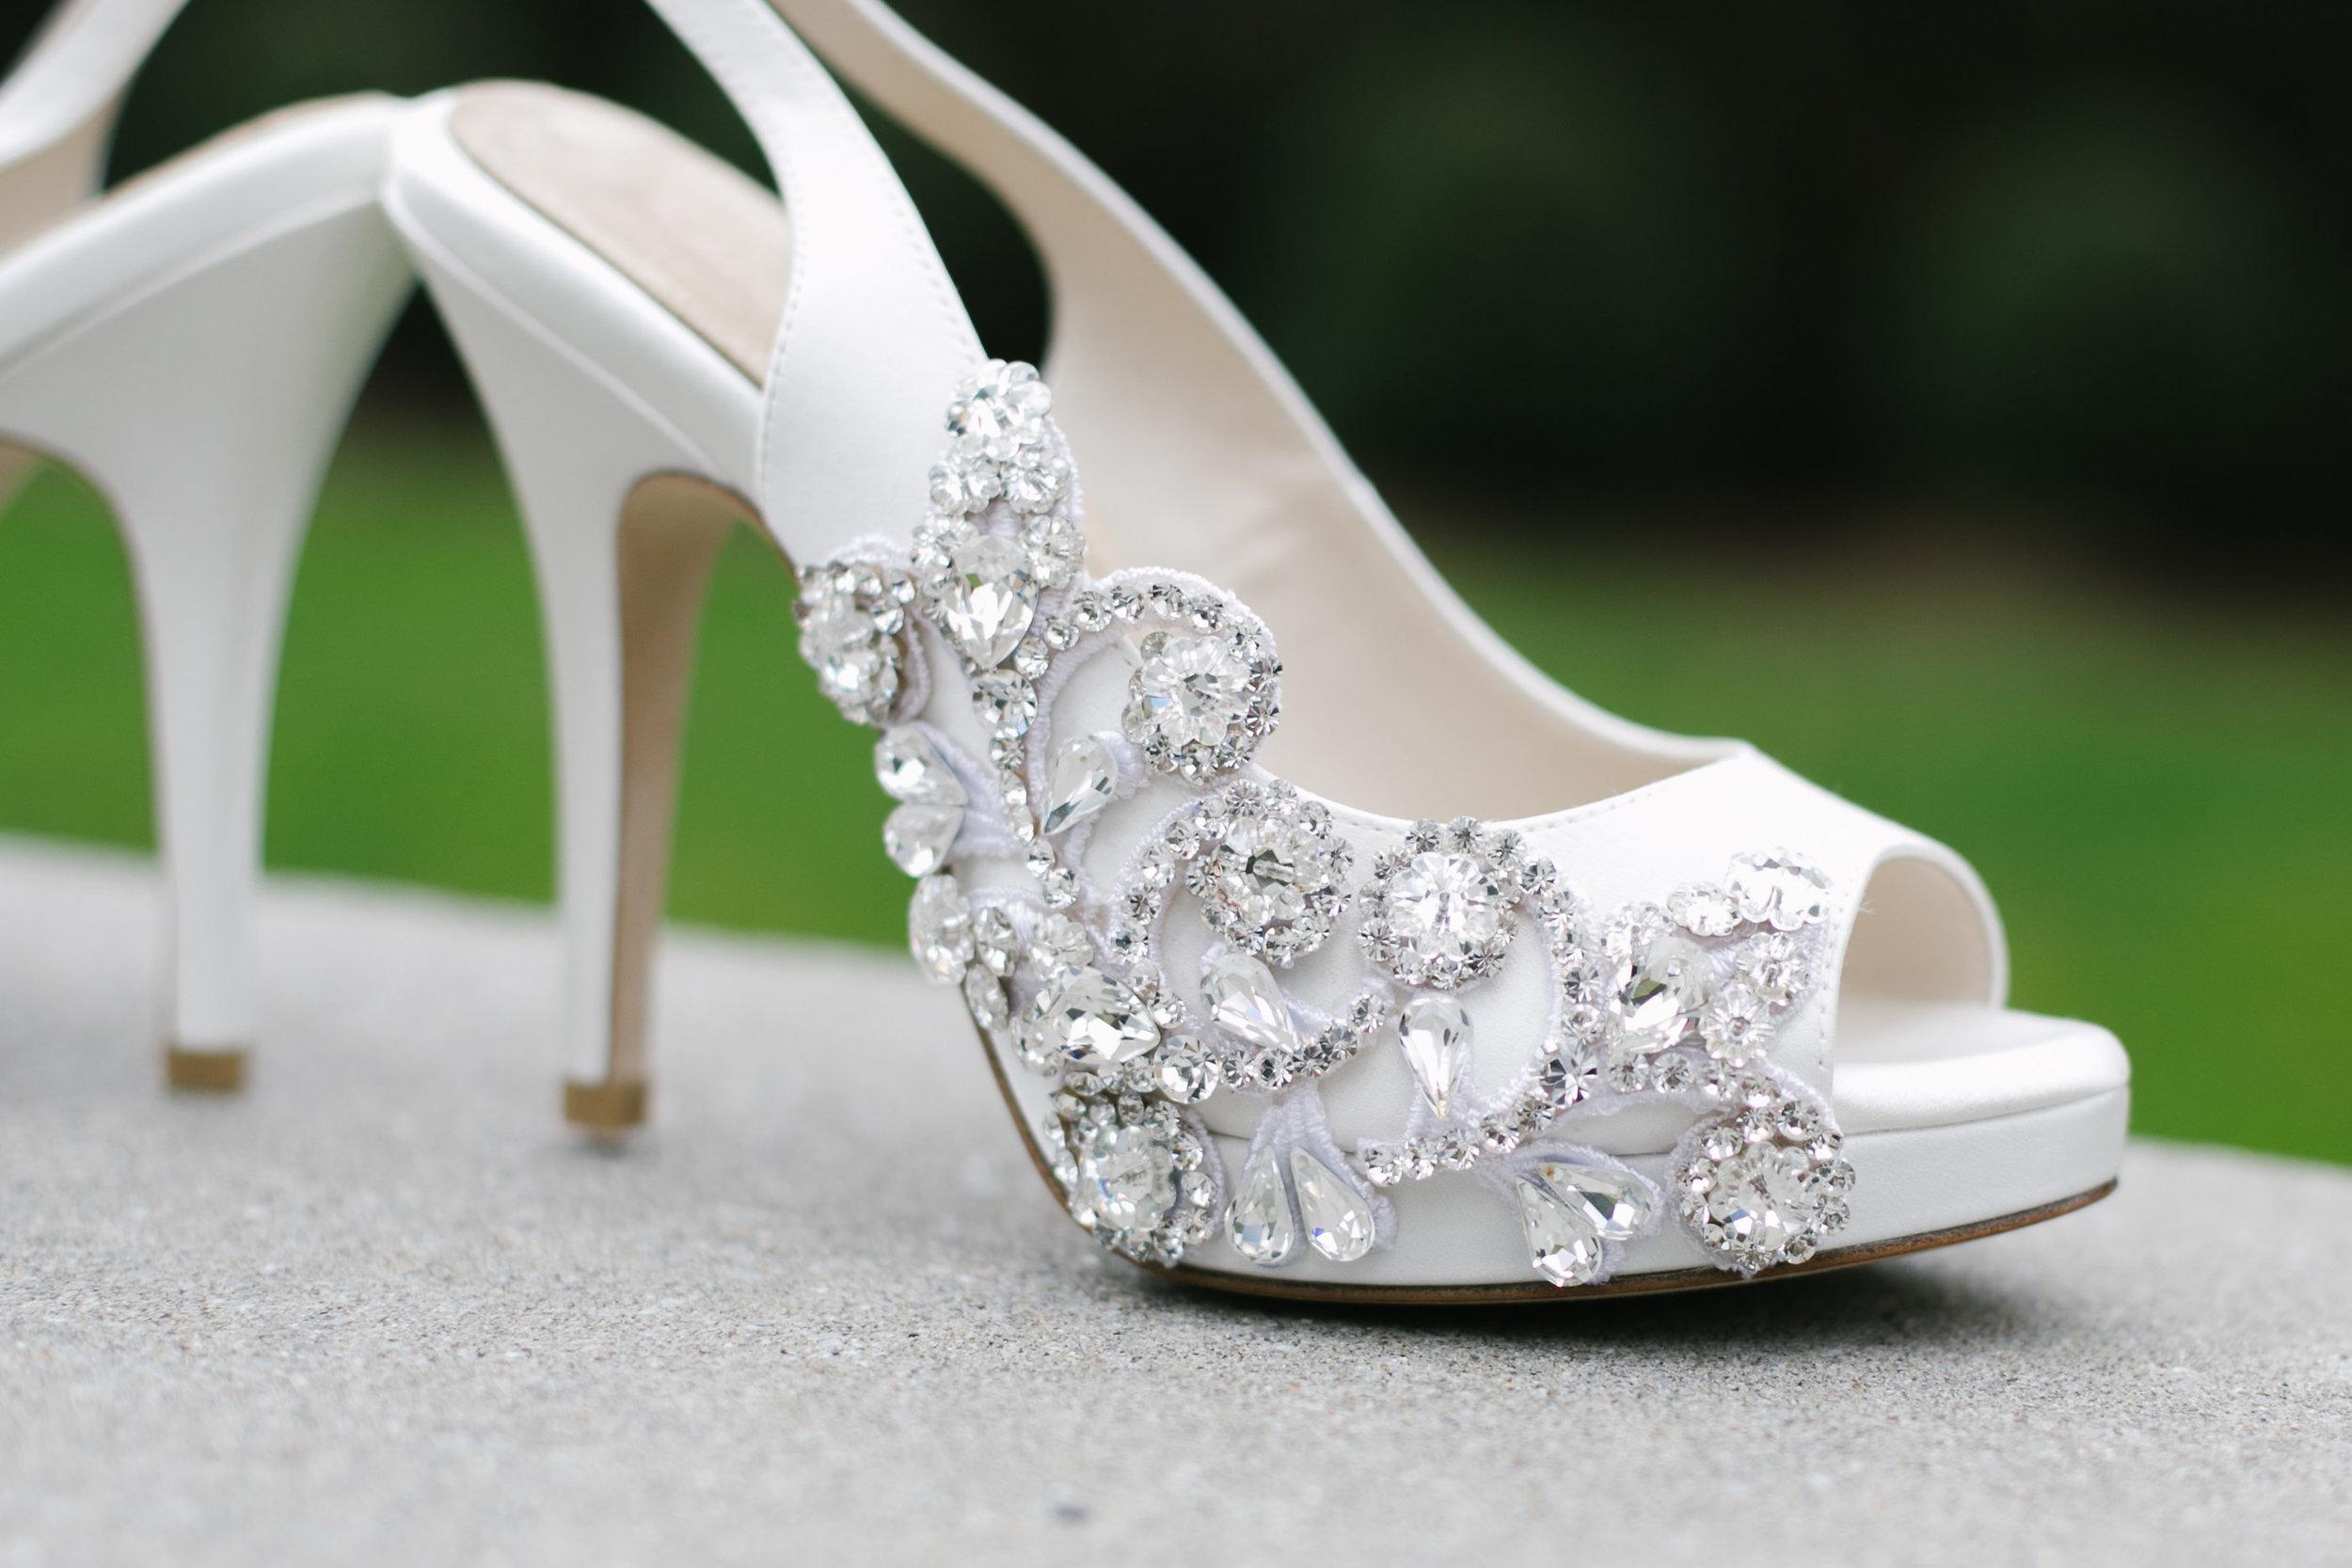 Ceci_New_York_Custom_Invitation_ New_Jersey_Wedding_Luxury_Personalized_Ceci_Style_Bride_Foil_Stamping5.jpg